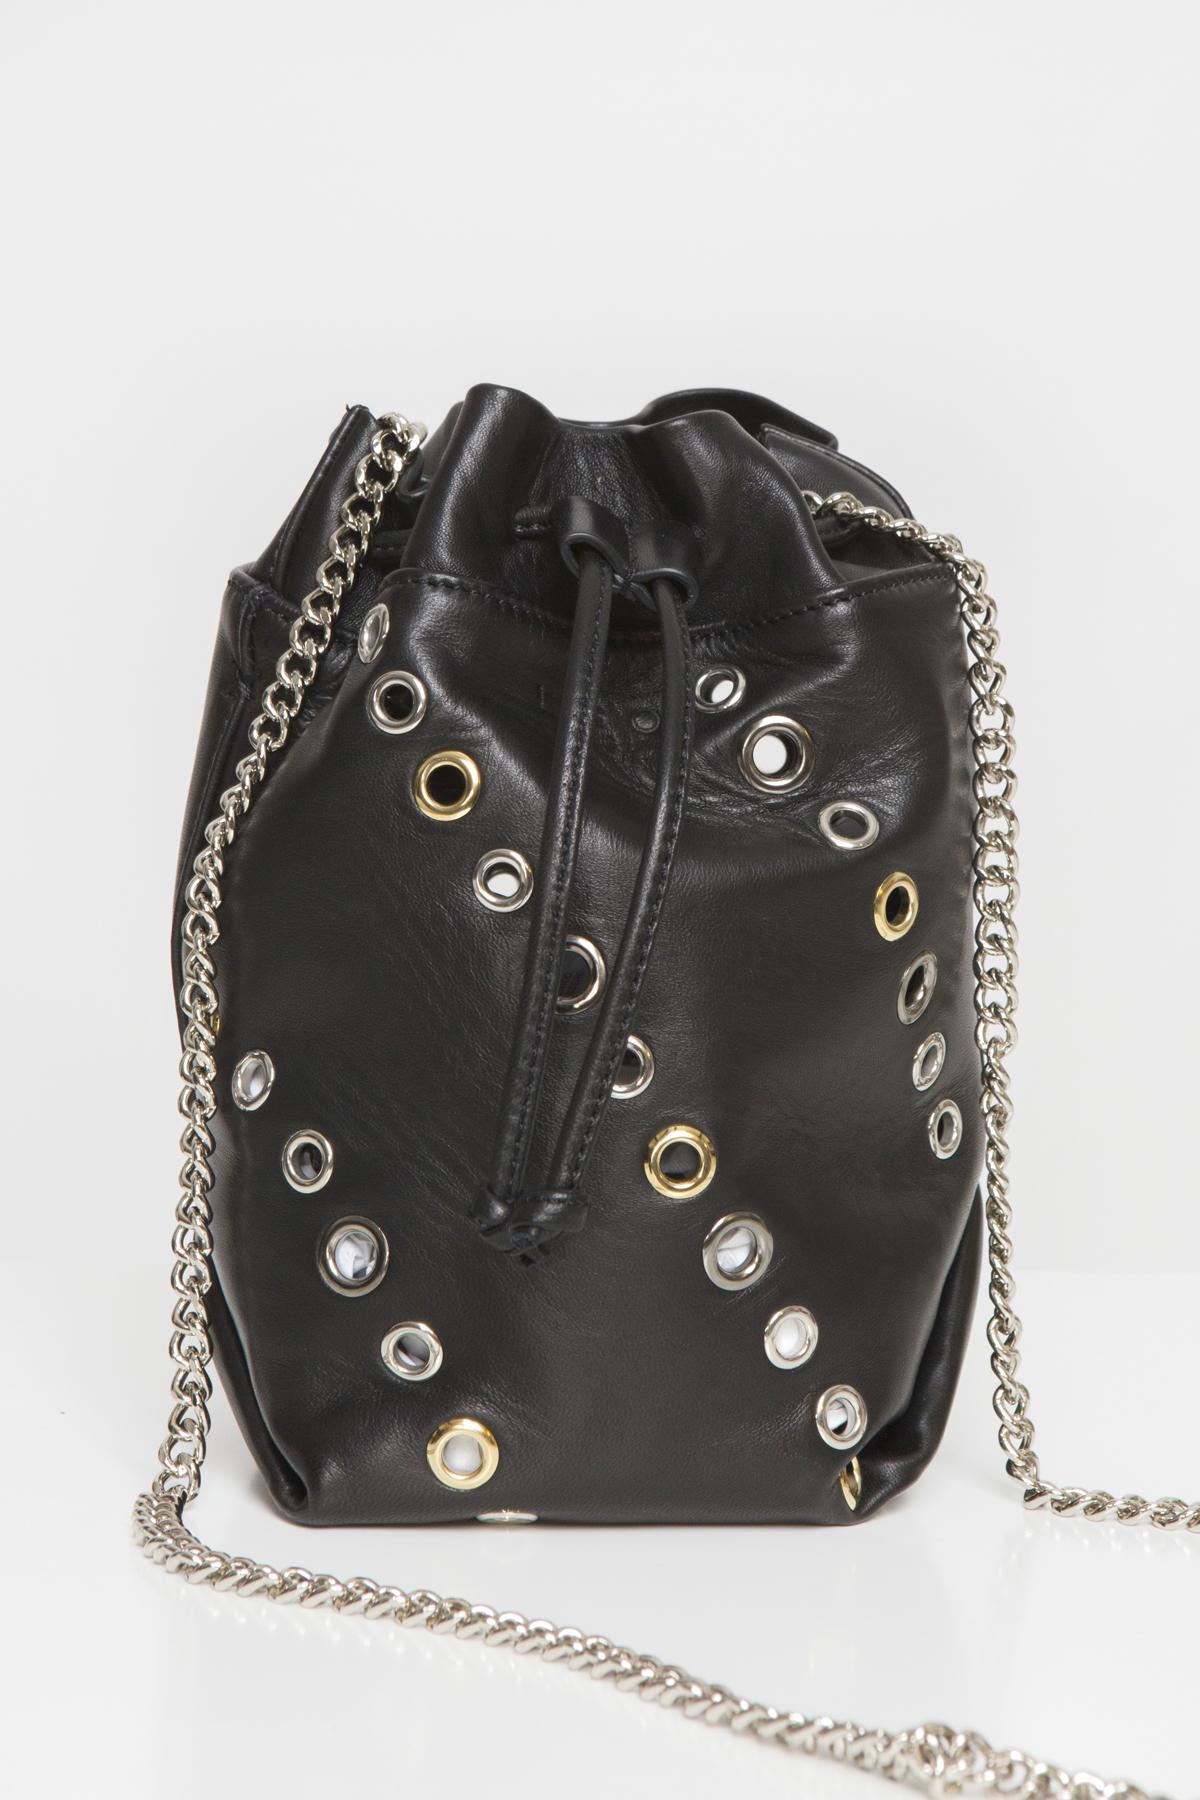 hofa-black-leather-bag-iro-pouch-matchboxathens